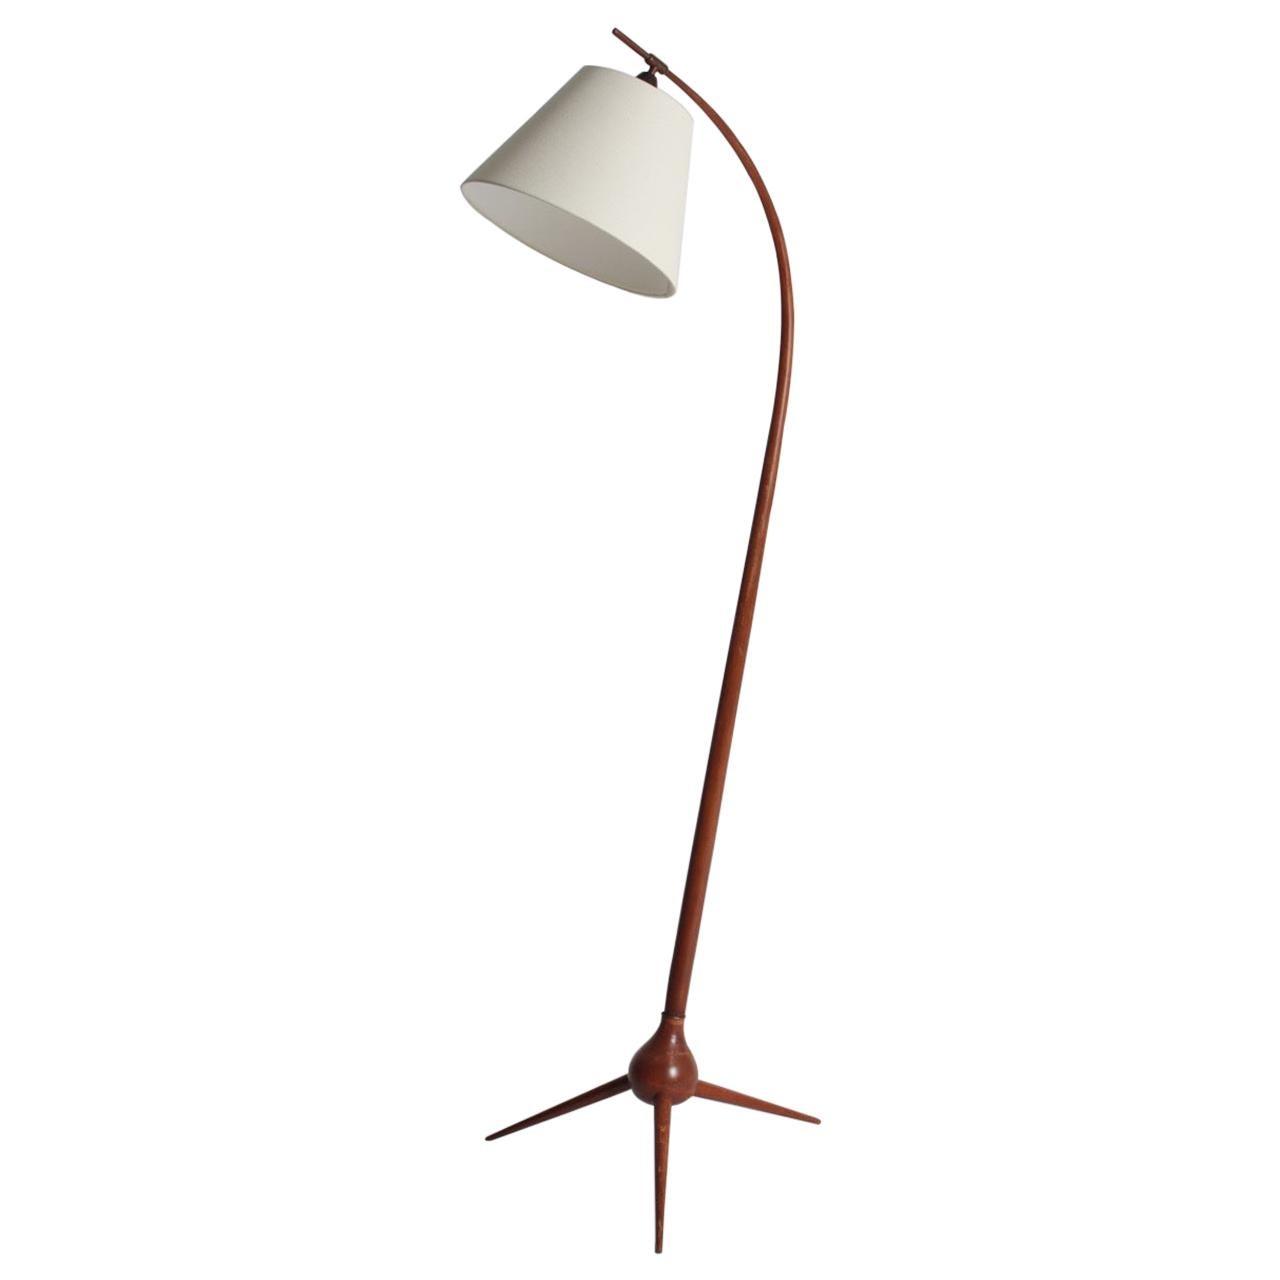 Elegant Midcentury Floor Lamp by Severin Hansen, Made in Denmark, 1950s